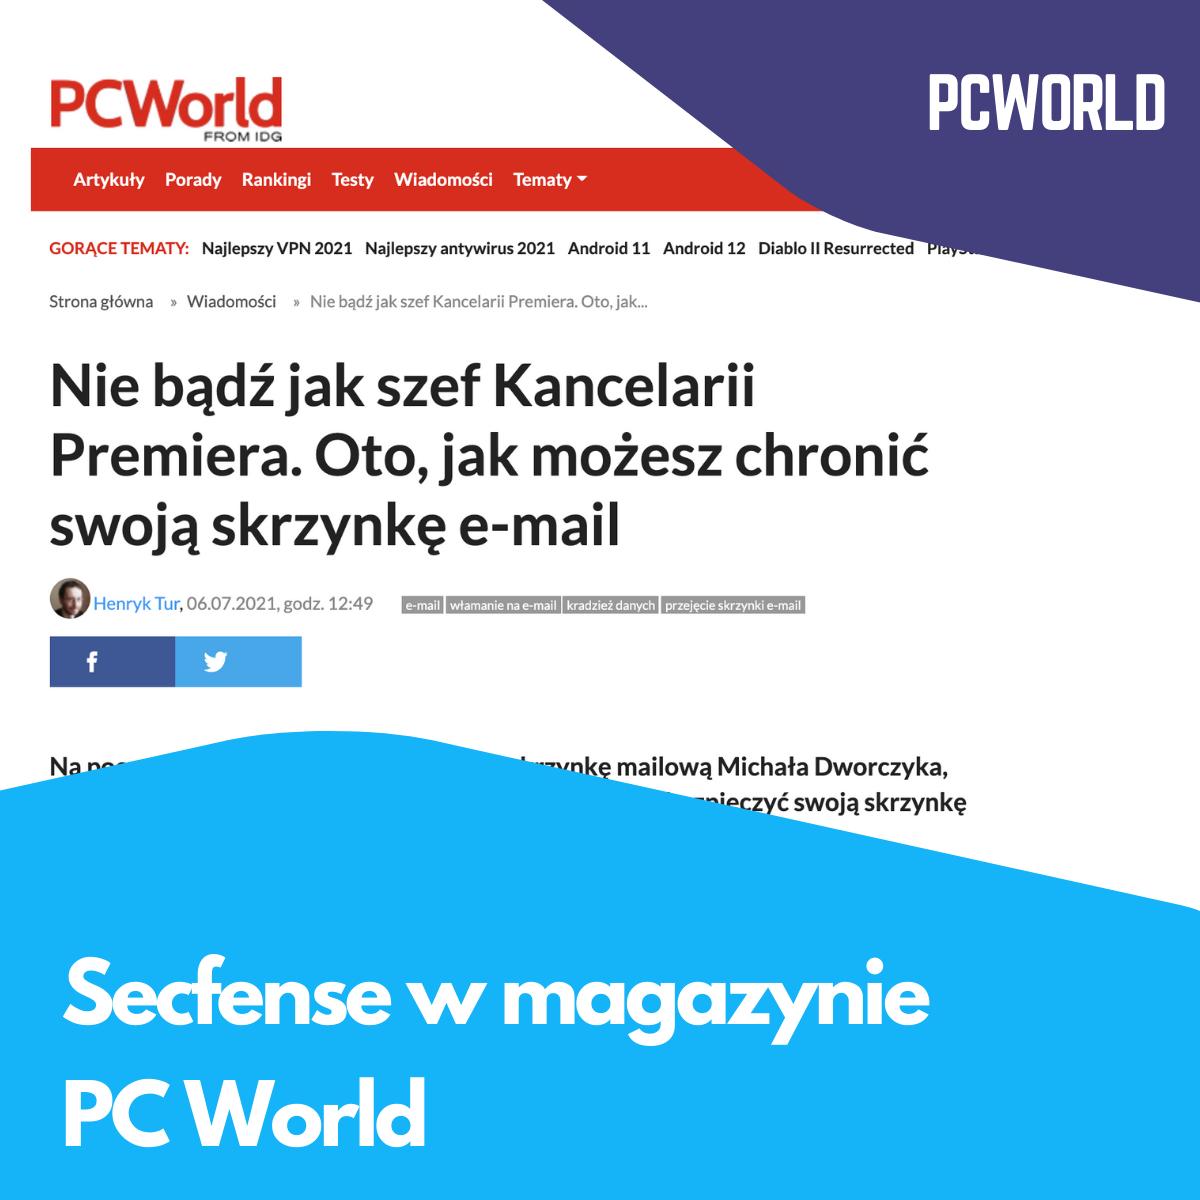 Secfense w magazynie PC World